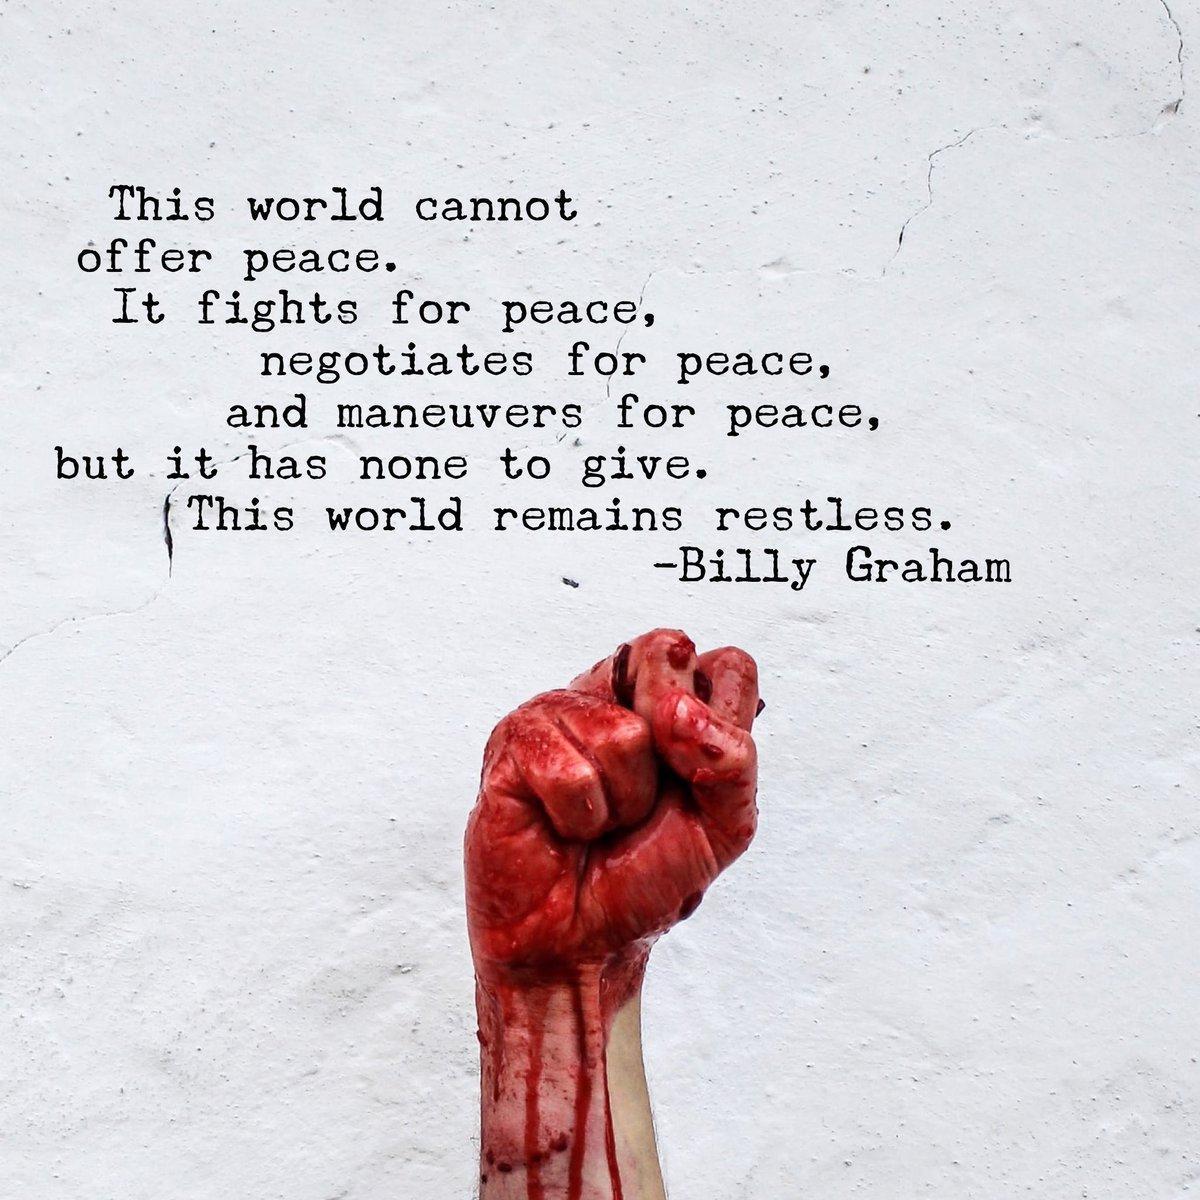 #BinanceSmartChain #BillyGraham #Binance #BUSD #BSC #ADA #Penthouse2Ep6 #peace #Penthouse2Ep6 #Peacekeeper #AmericaFirst #AmericansFirst #TREASURE #trendingtopic